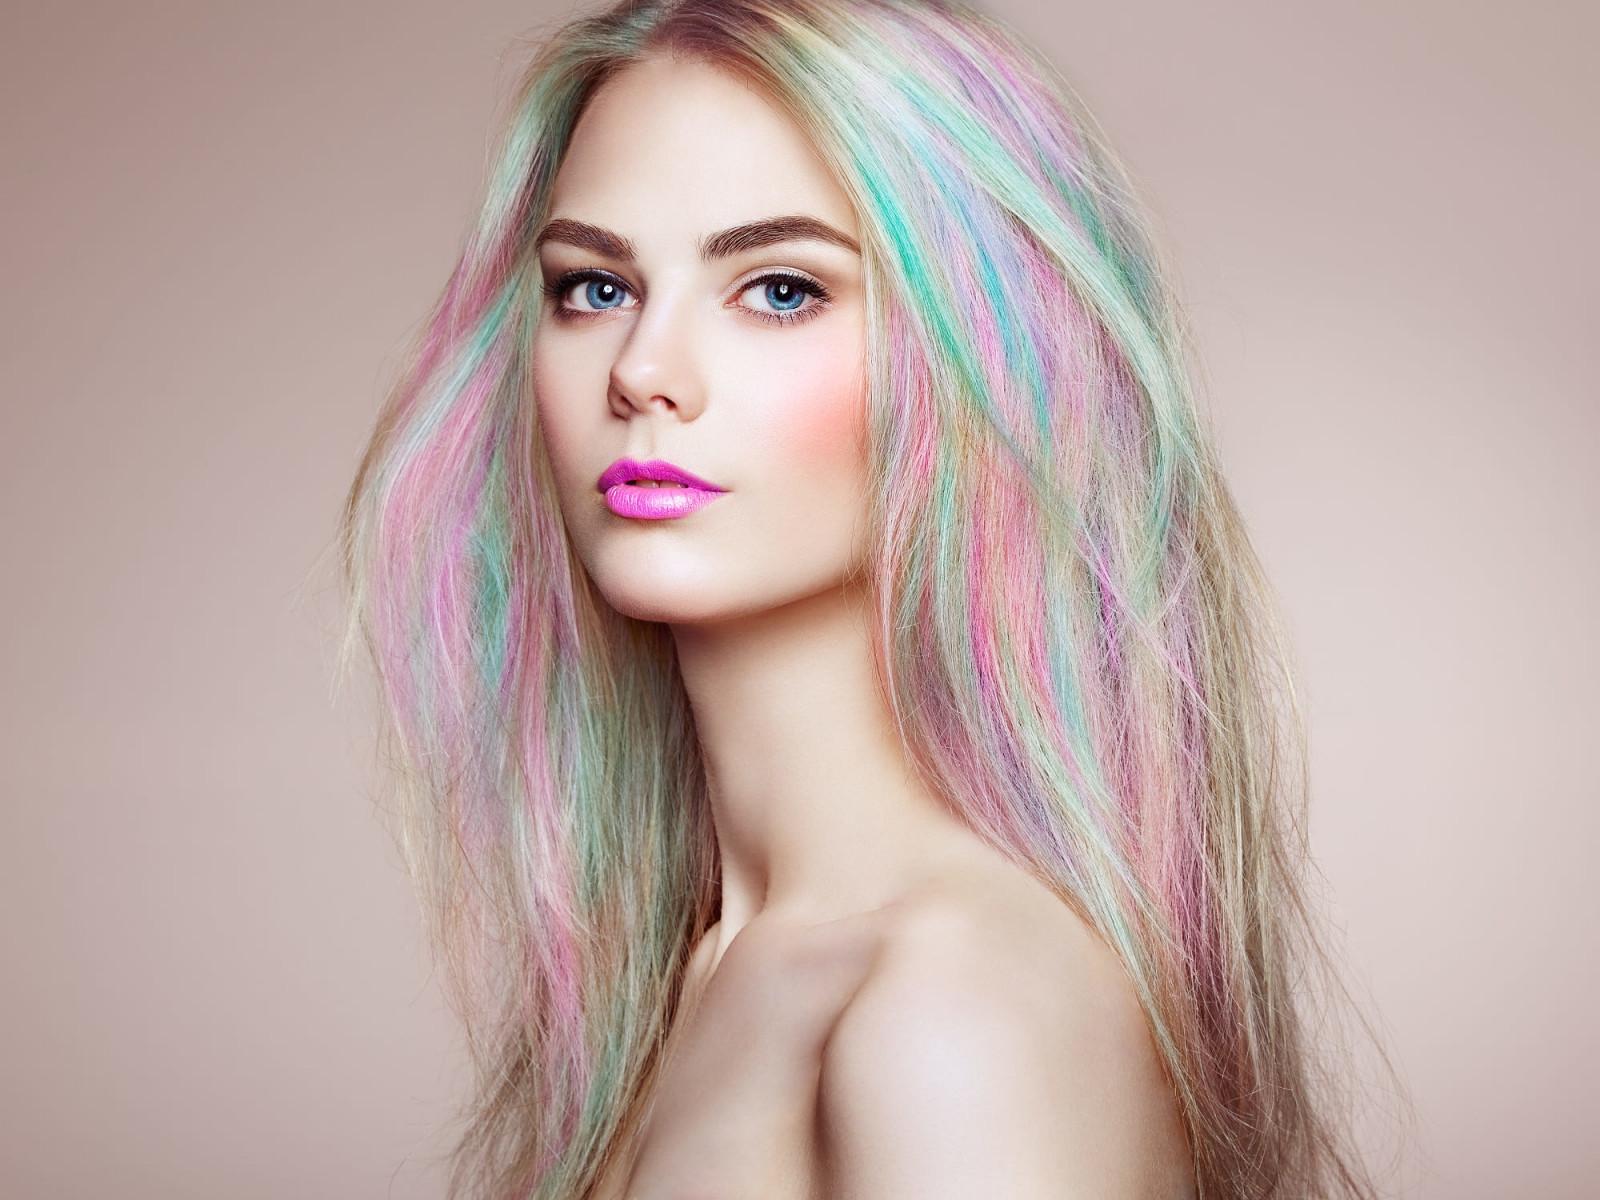 Wallpaper Face Women Simple Background Long Hair: Wallpaper : Portrait, Pink Lipstick, Face, Simple